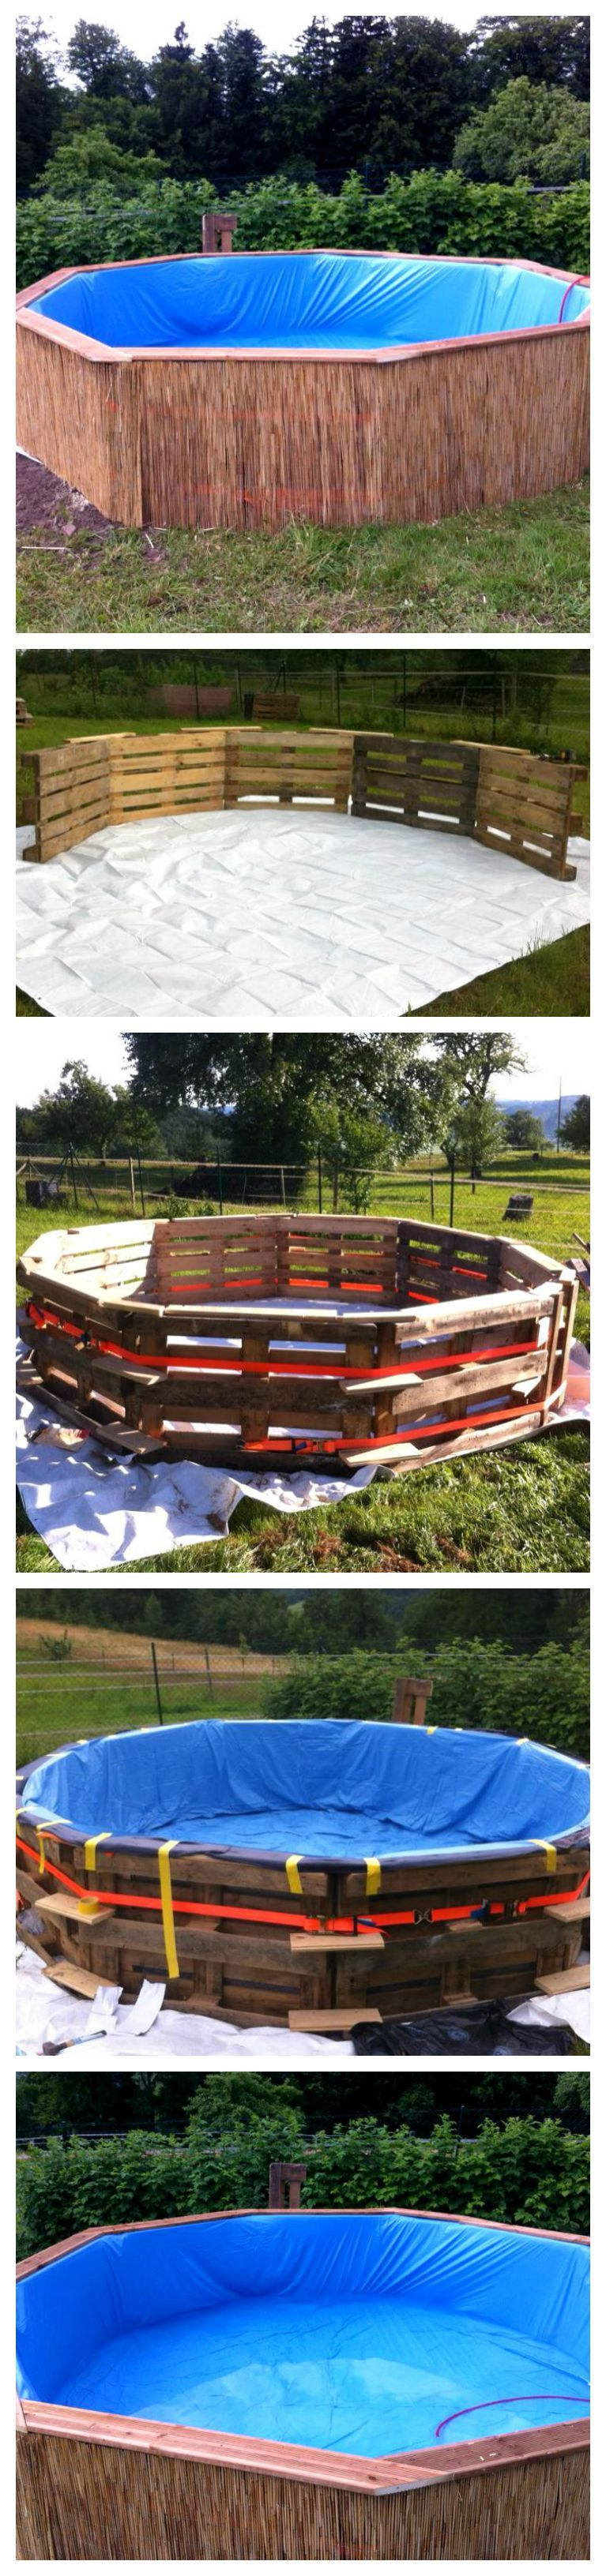 Creative Shelters Pvc And Tarp Shade Tent Patio Backyard Shade Outdoor Shade Shade Tent